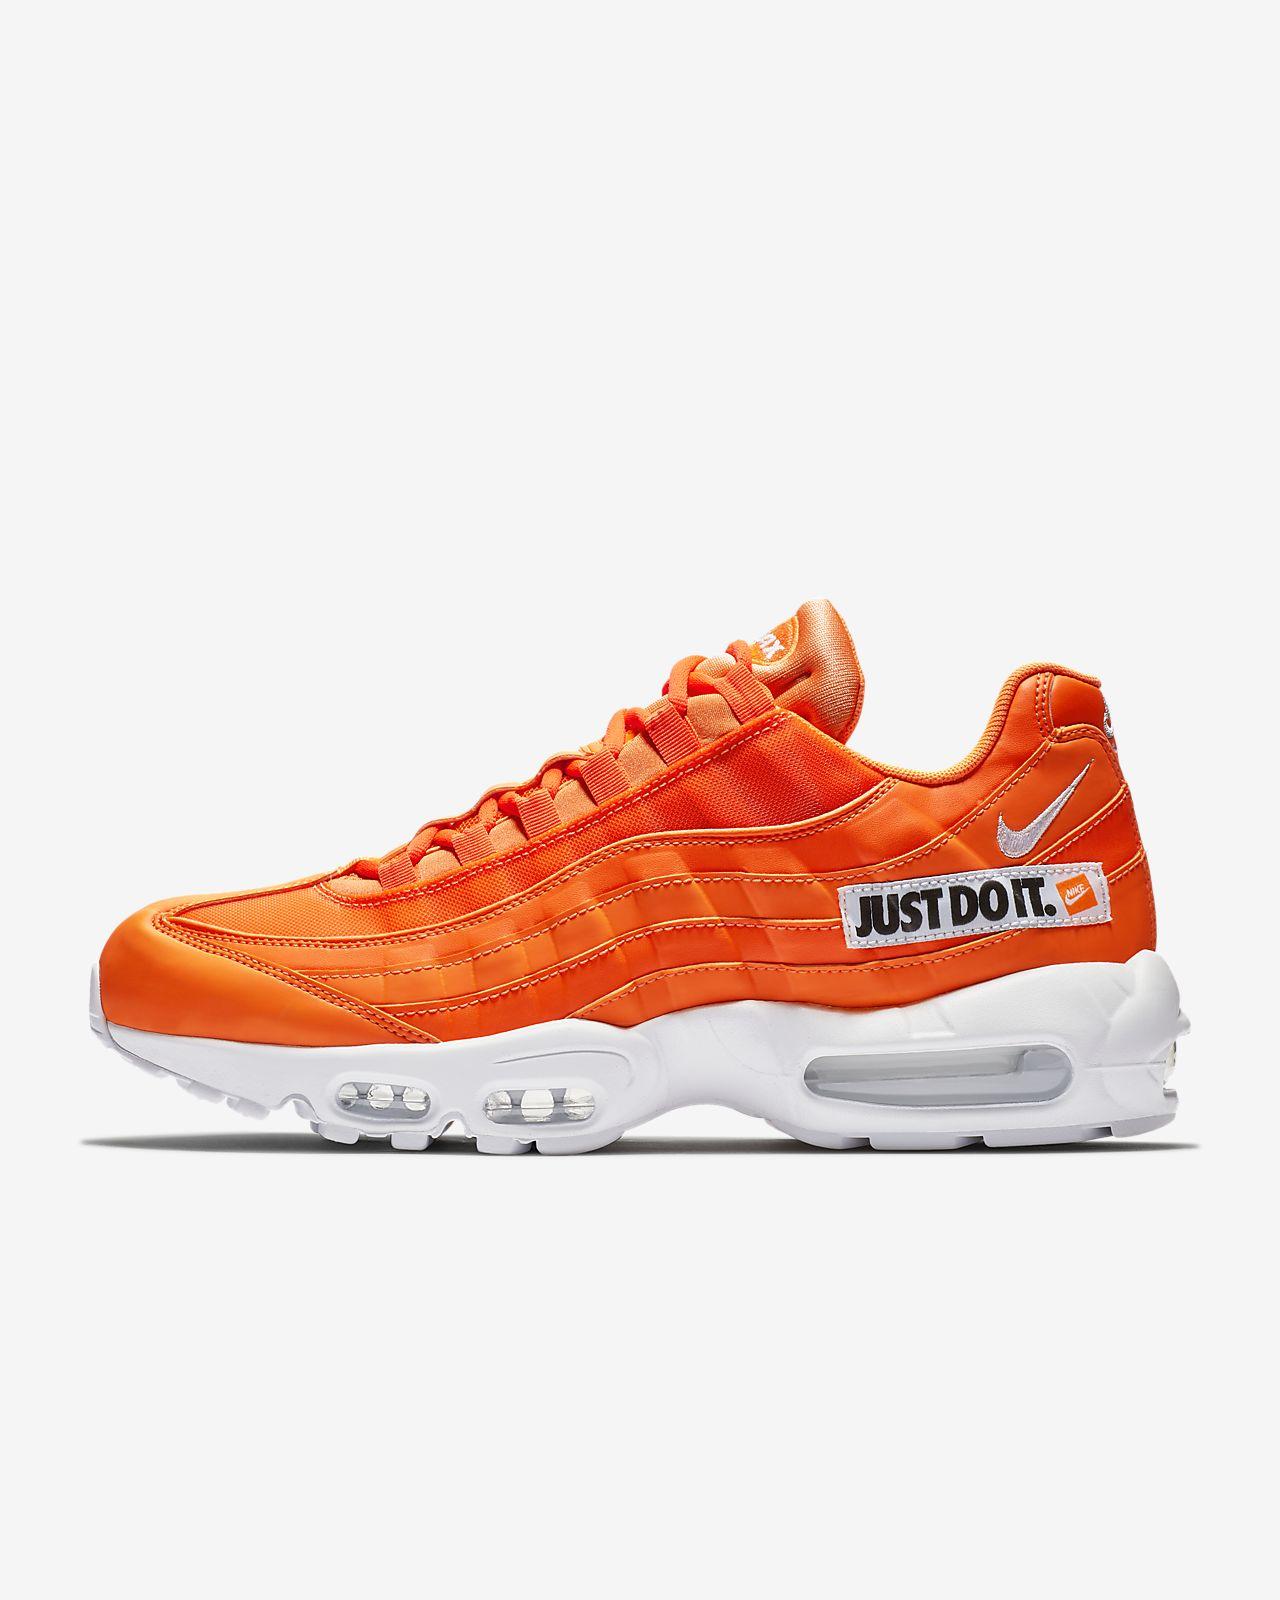 Nike Air Max 95 SE herresko